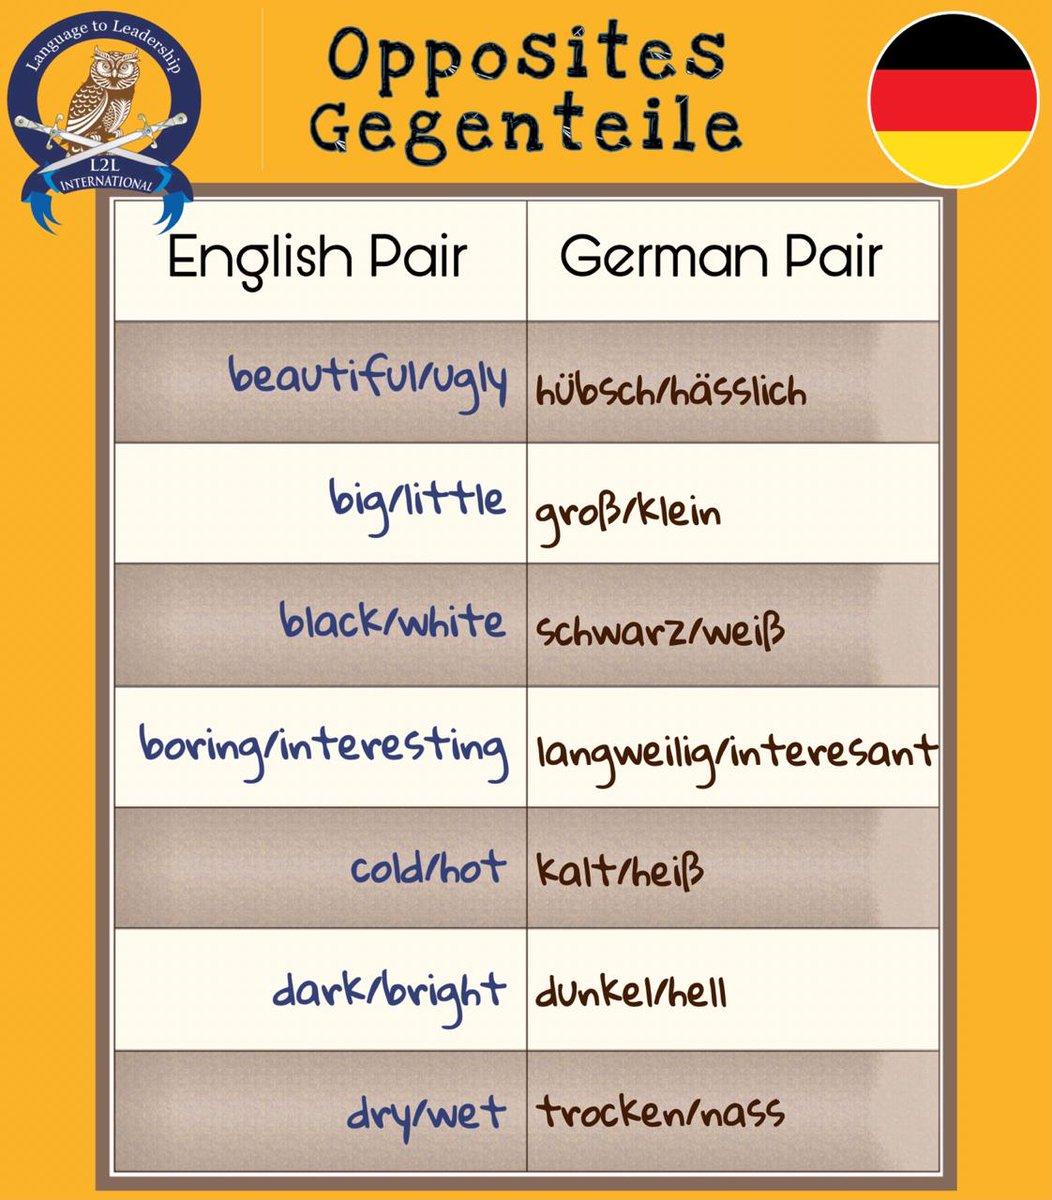 Opposites Gegenteile! English Pair, German Pair #german #germany #germanlanguage #learngerman #germanlearning #germantutorial #germancourse #germanclasses #l2l #l2linternational #germanclass  #germanverbs #germanvocabulary  #germanphrases  Know More...l2linternational.com/germanpic.twitter.com/VggSu17Ftc